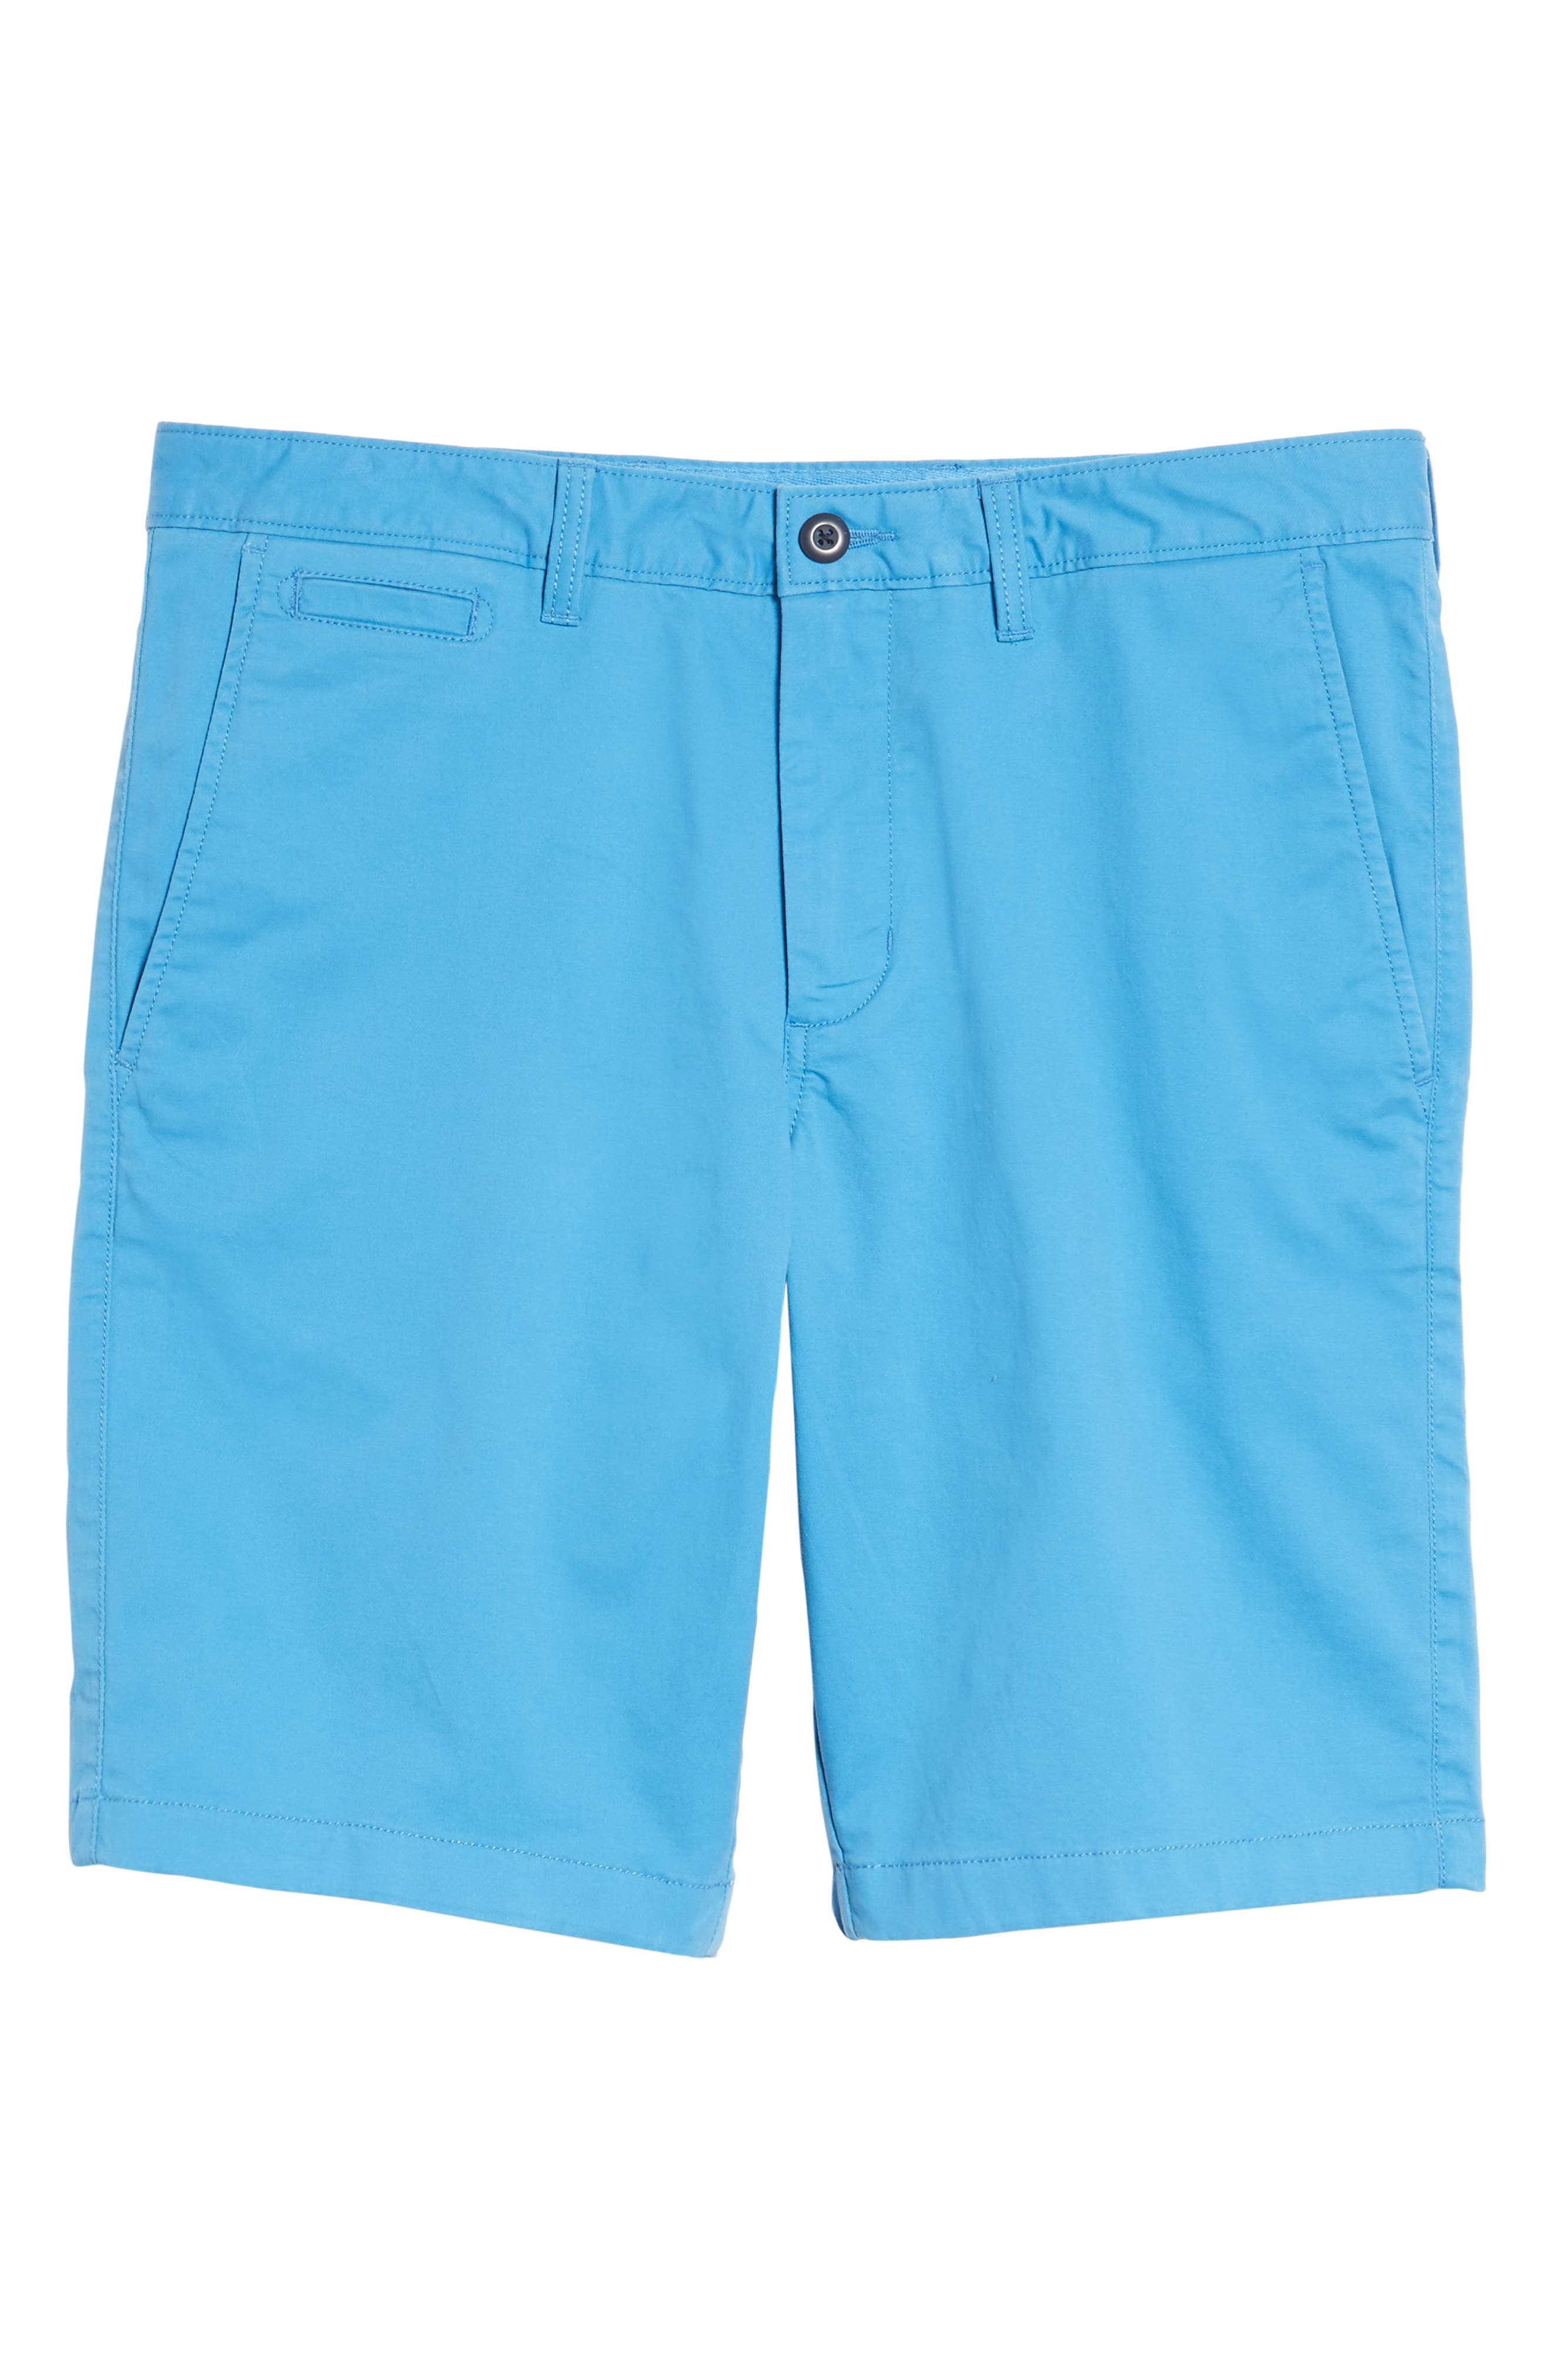 Ballard Slim Fit Stretch Chino 11-Inch Shorts,                             Alternate thumbnail 8, color,                             Blue Camp